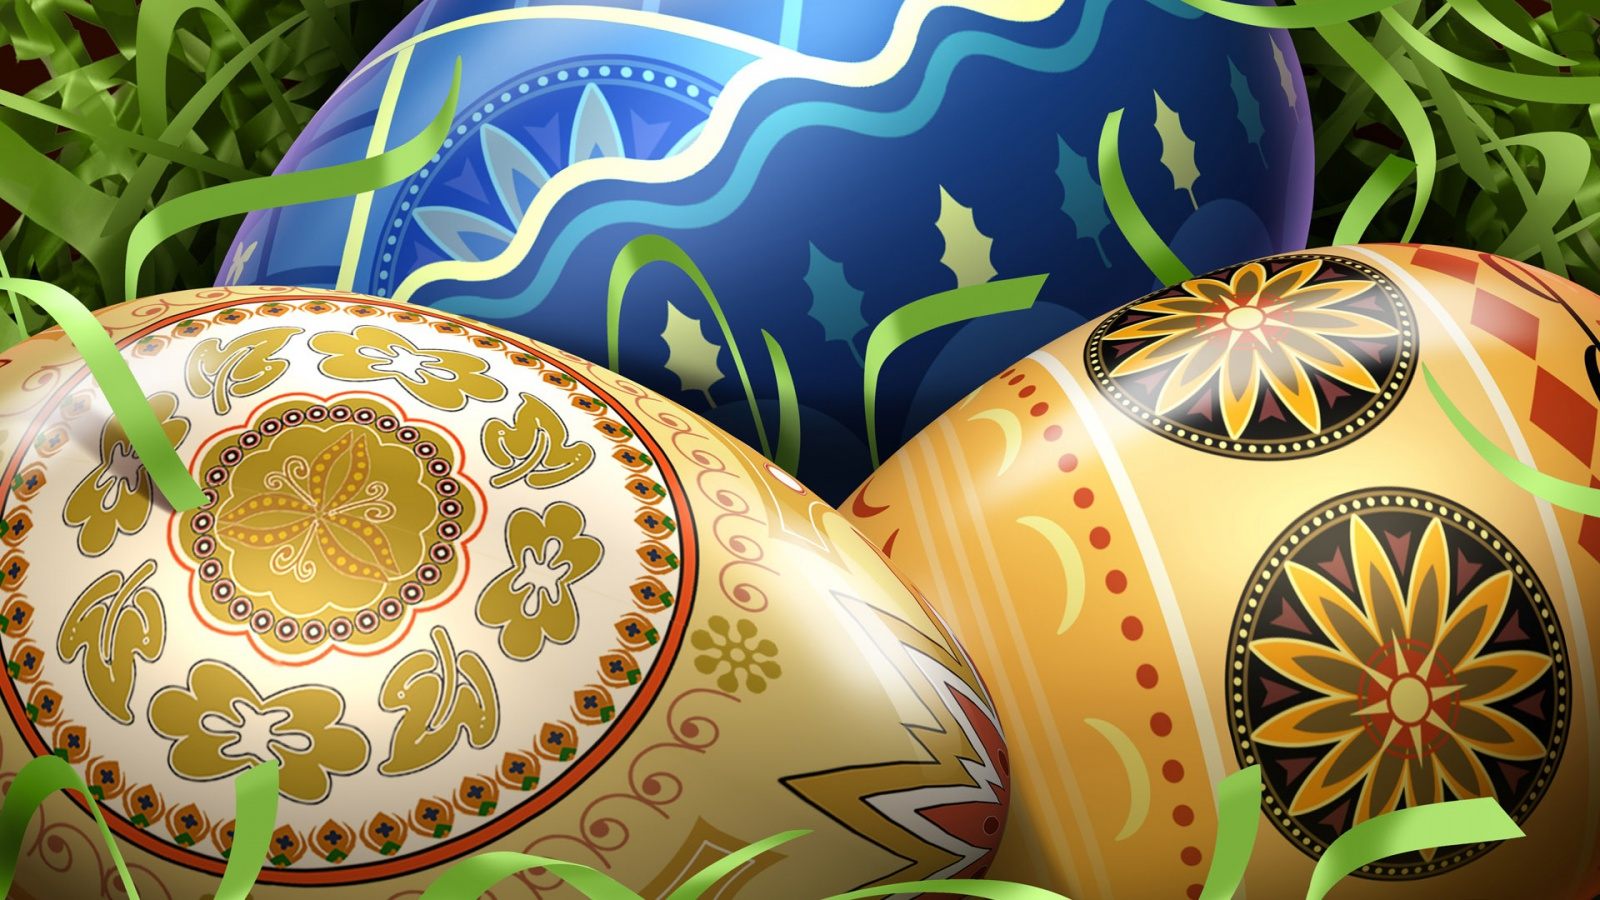 Easter Eggs wallpaper desktop background in 1600x900 HD Widescreen 1600x900